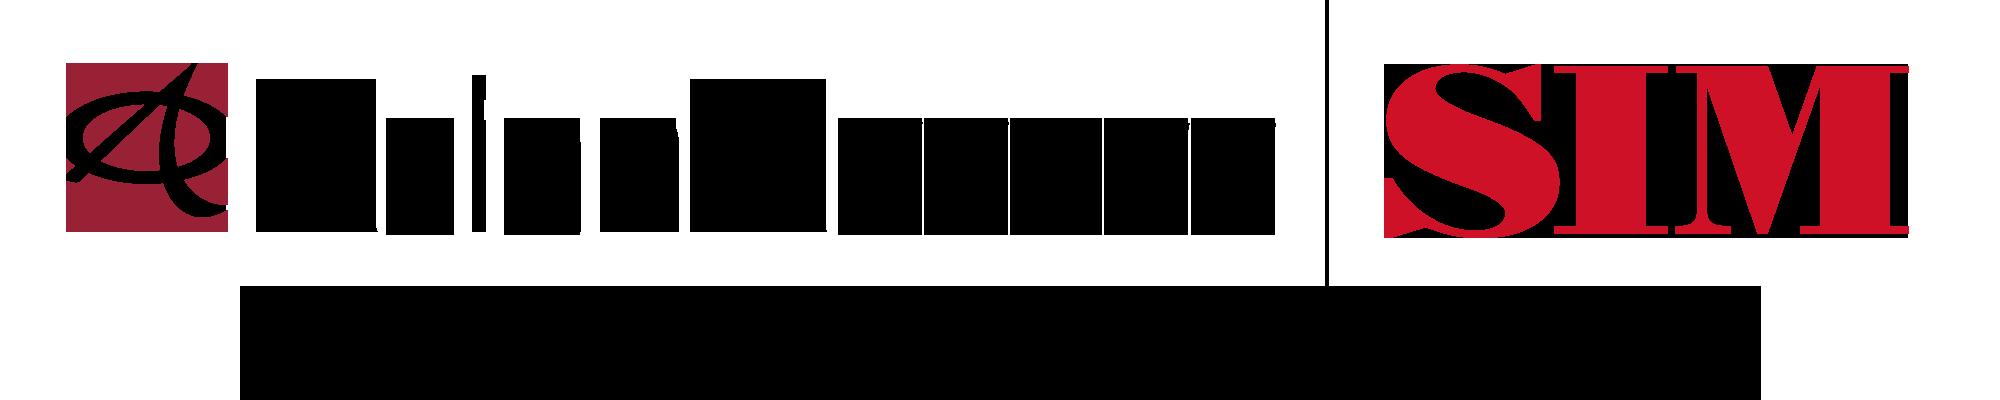 A2-SIM-2000x400-TAG